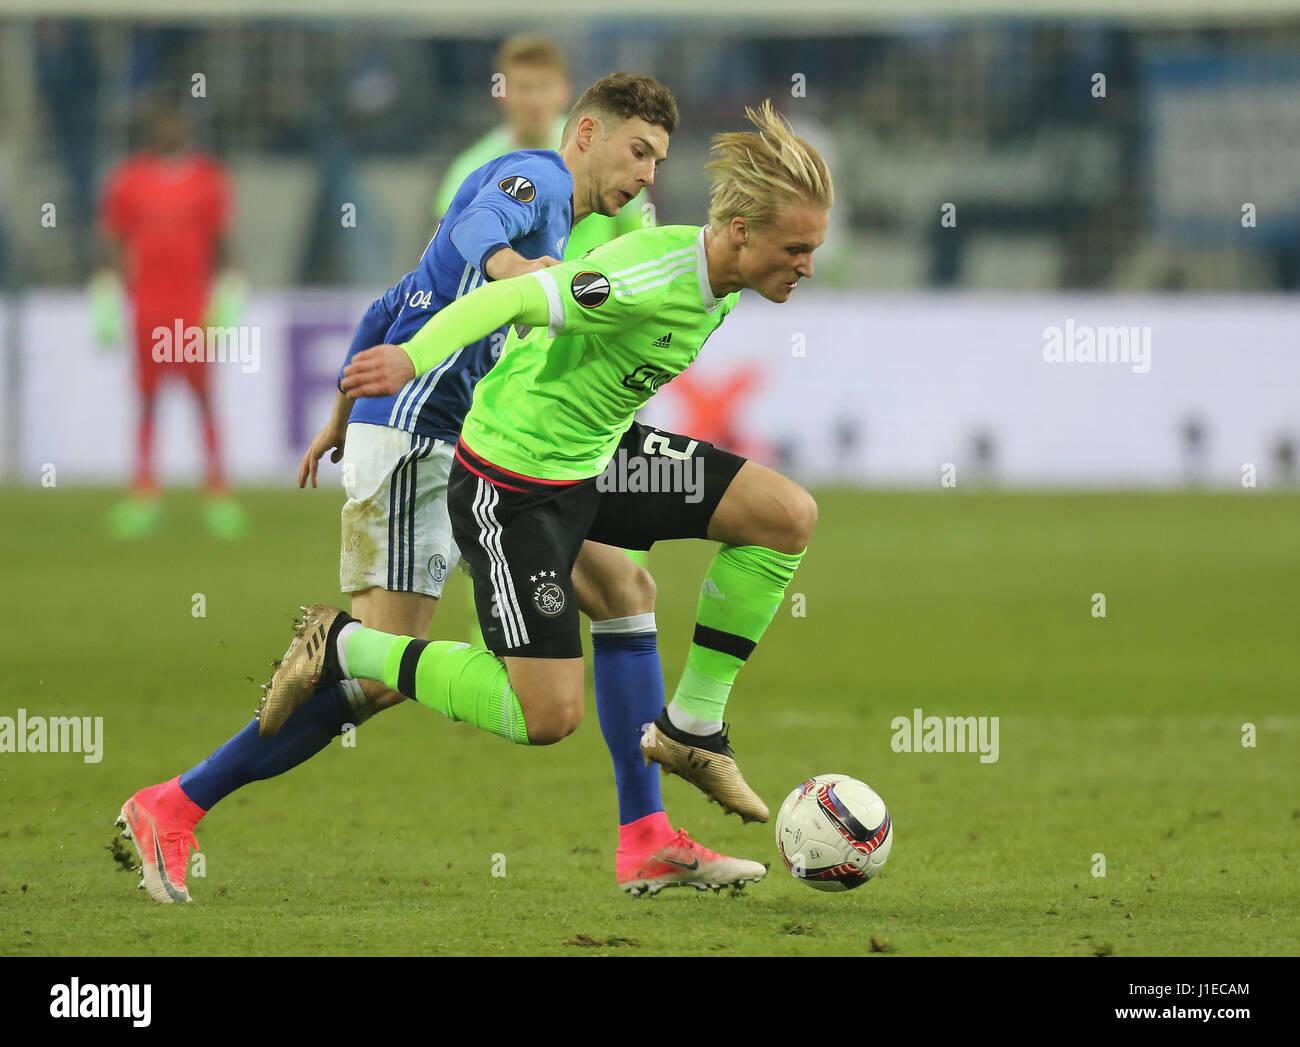 Gelsenkirchen, Germany. 20th Apr, 2017. UEFA Europa League, semifinals 2nd leg, FC Schalke 04 vs Ajax Amsterdam: - Stock Image